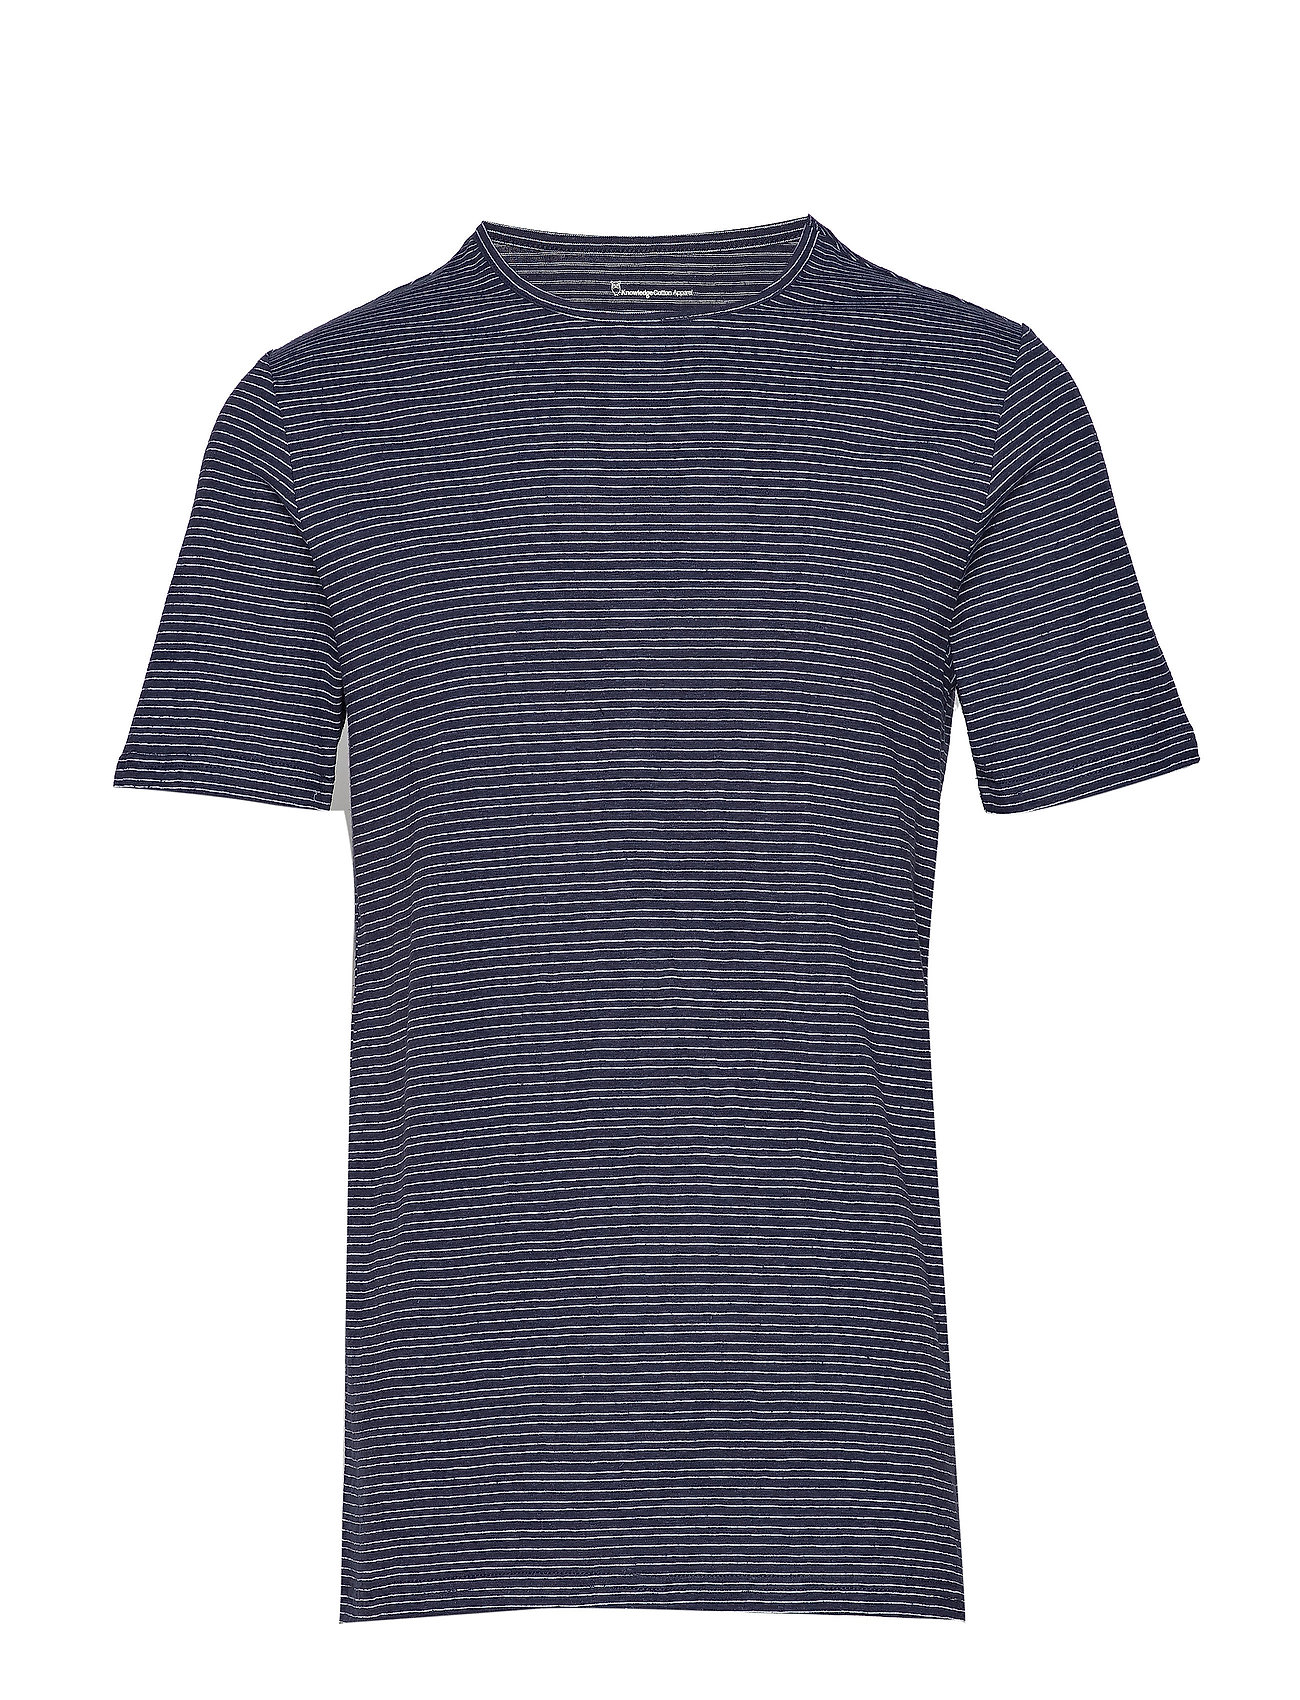 Knowledge Cotton Apparel O neck striped T shirt OCS Ögrönlar